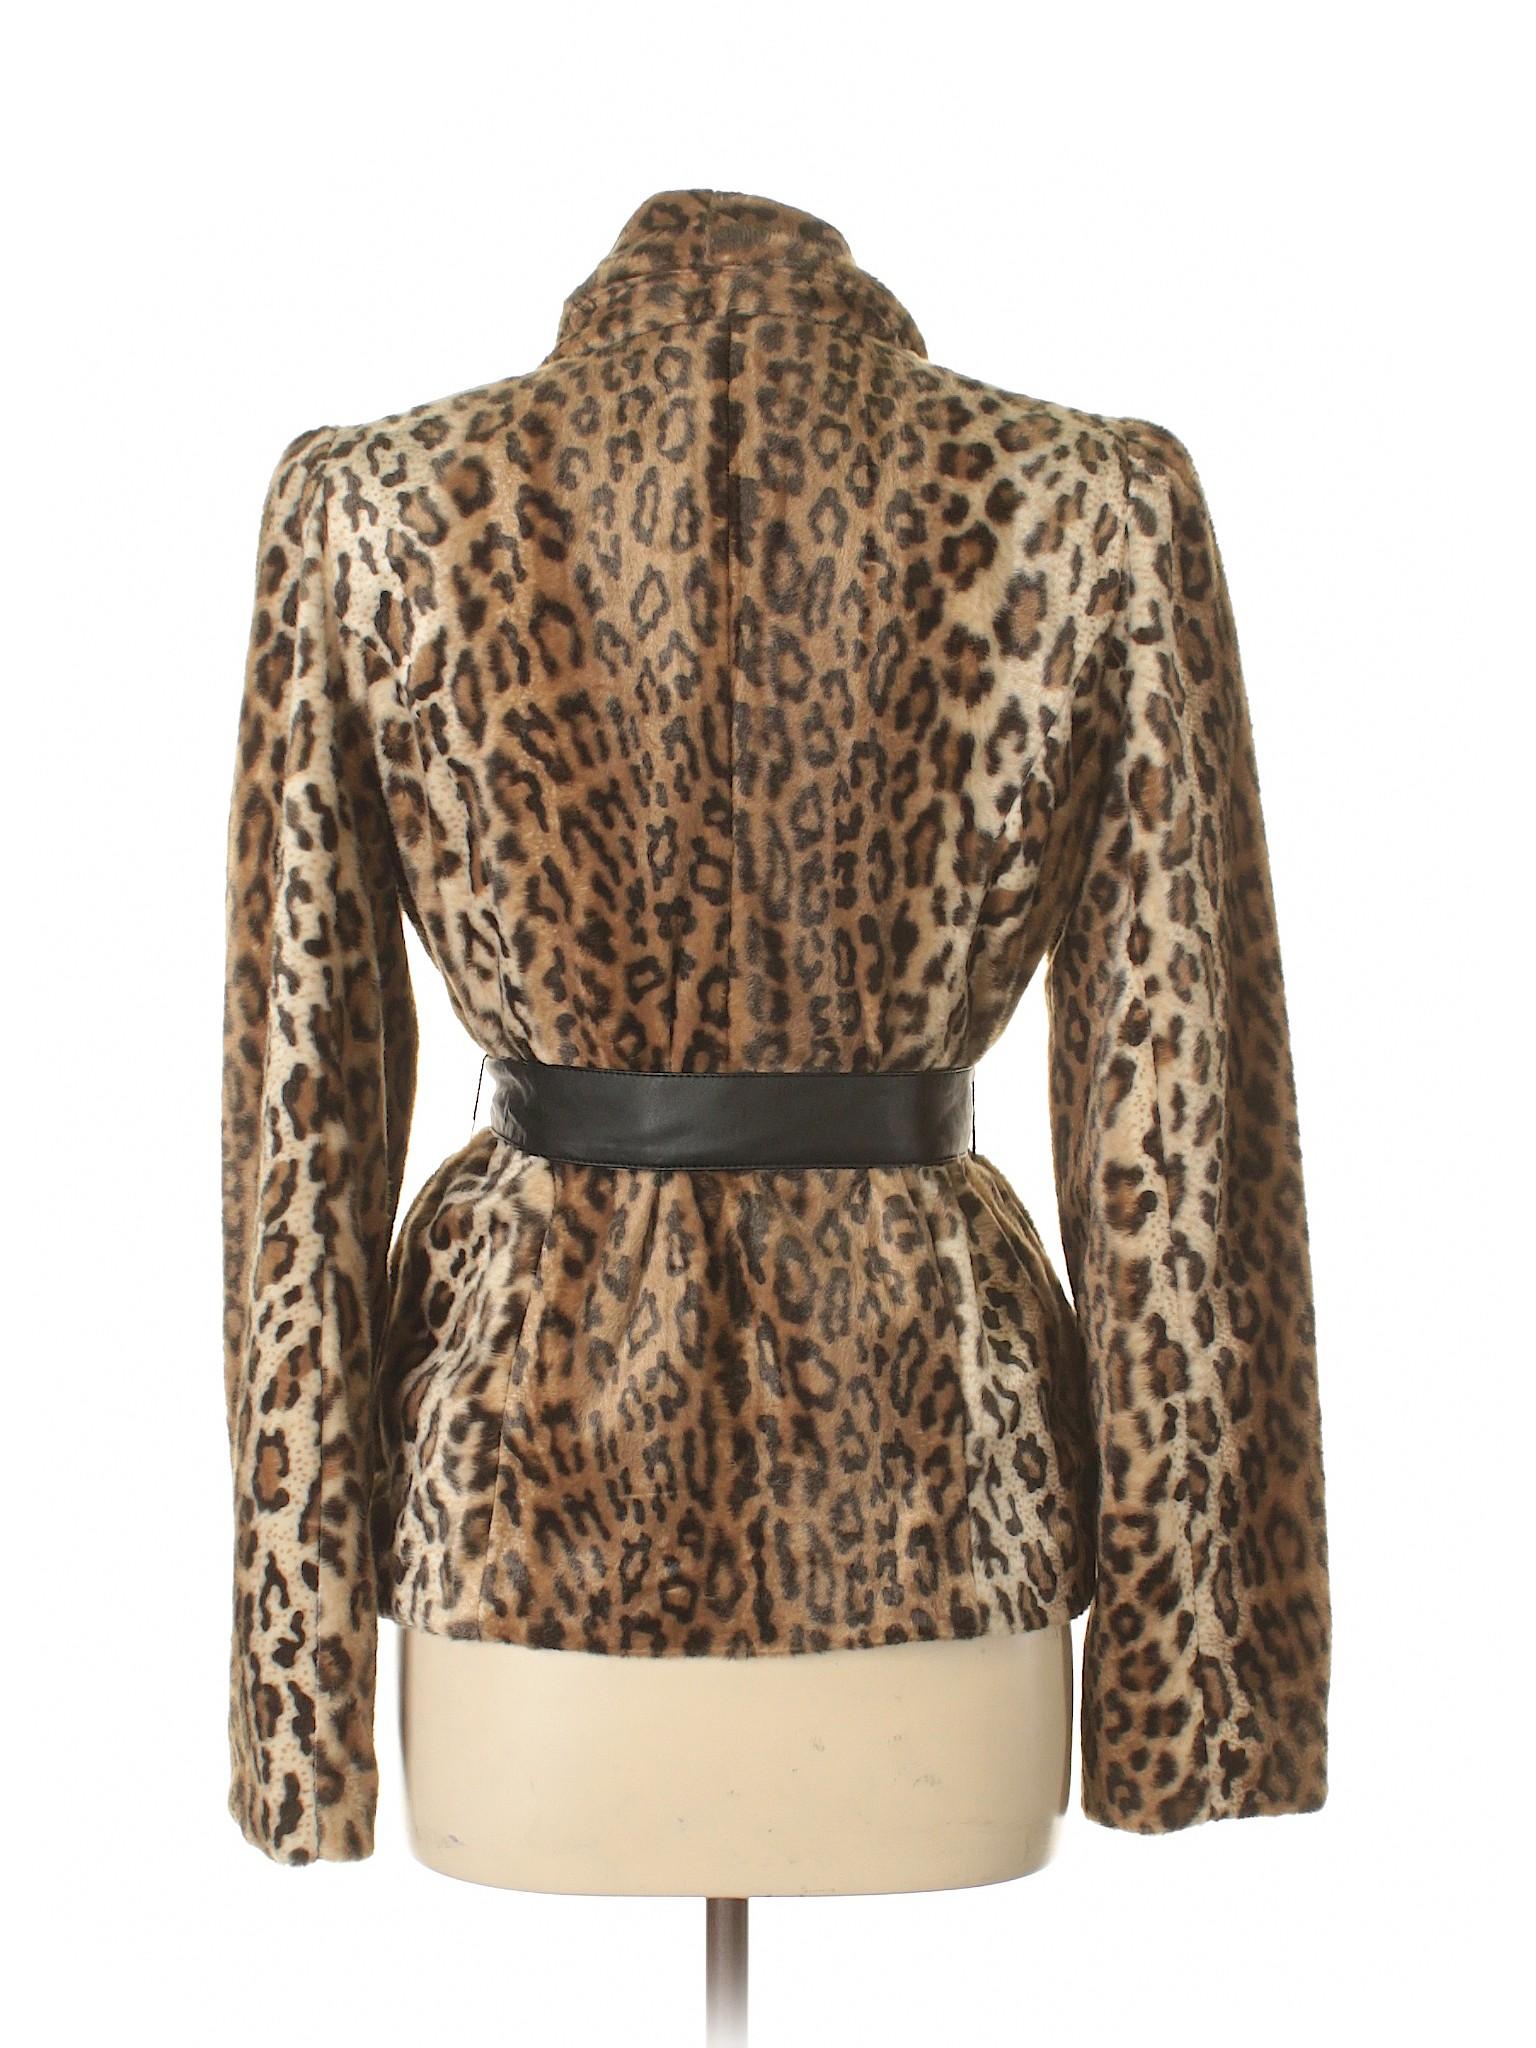 Boutique Concepts International Jacket Leather INC Faux CrqCWEvcw